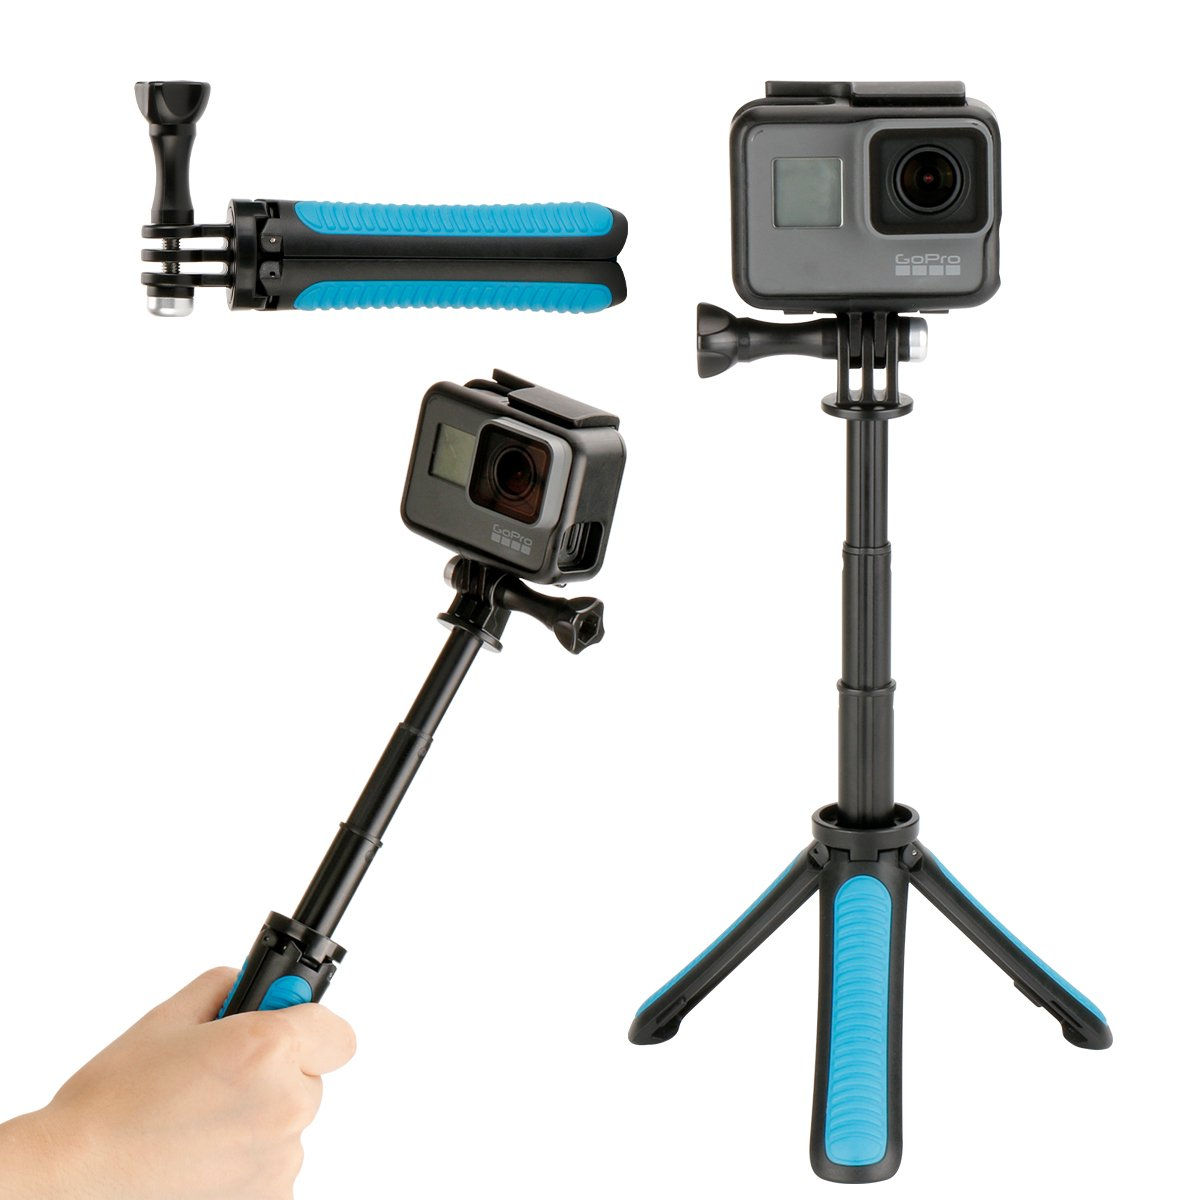 Ulanzi Gopro Waterproof Hand Grip Adjustable Extension Selfie Stick Handheld Monopod for GeekPro/GoPro HD Hero 6 5 4 3+ 3 2 1, AKASO, SJCAM SJ4000 SJ5000 Xiaomi Yi(with Wrist Strap and Screw)